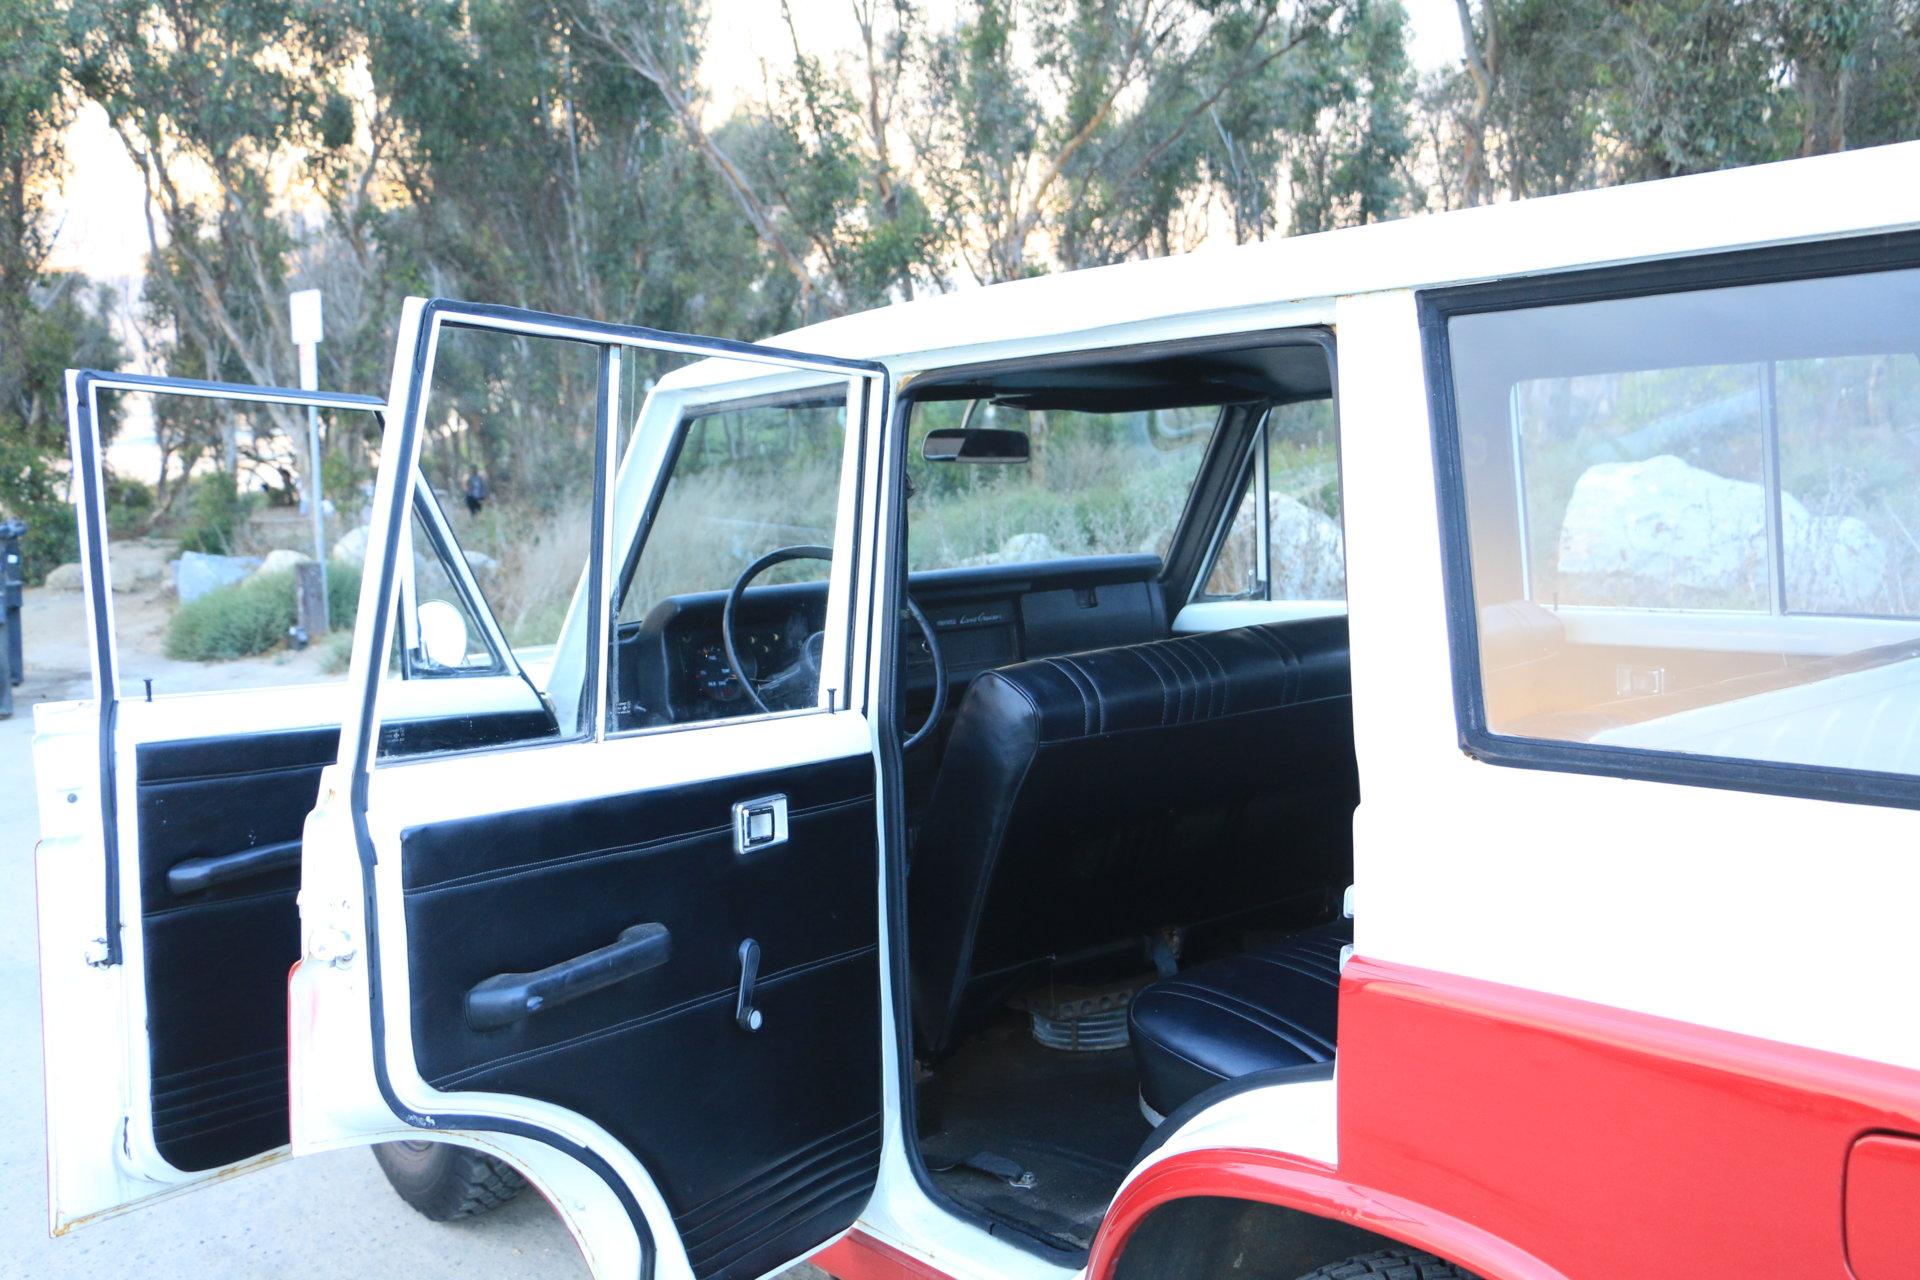 For Sale 1973 Toyota Fj55 Land Cruiser Ih8mud Forum Img 5343